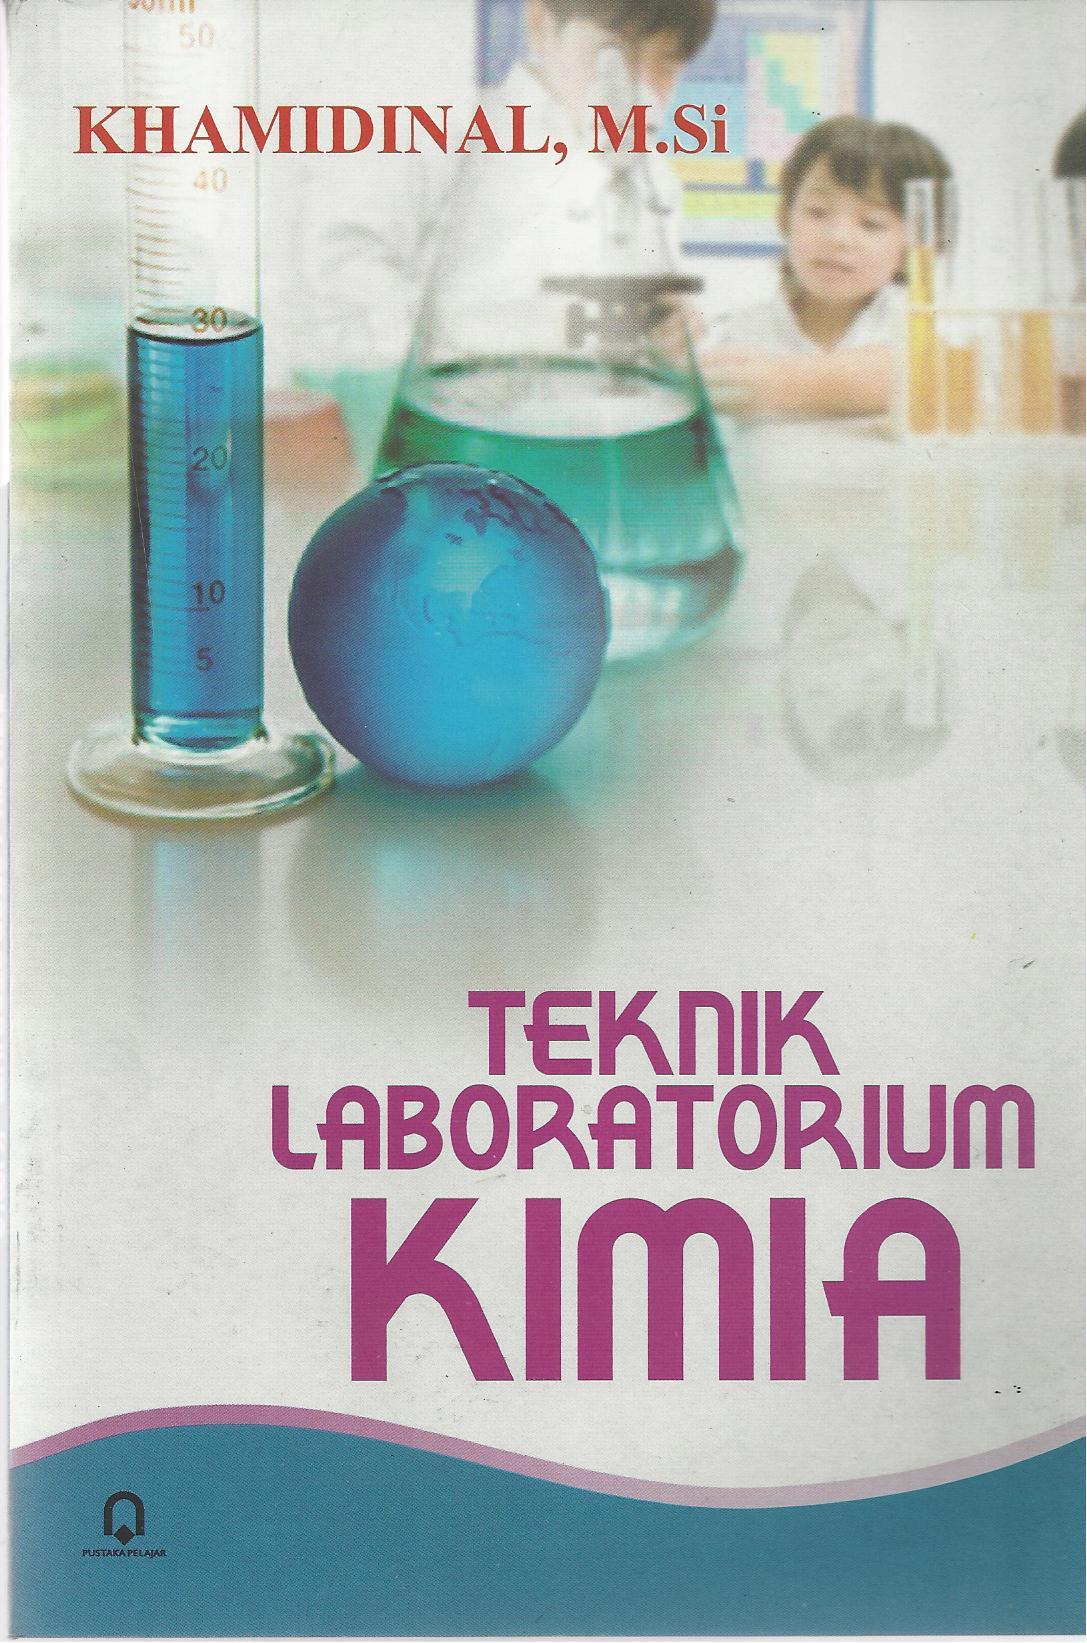 Teknik Laboratorium Kimia